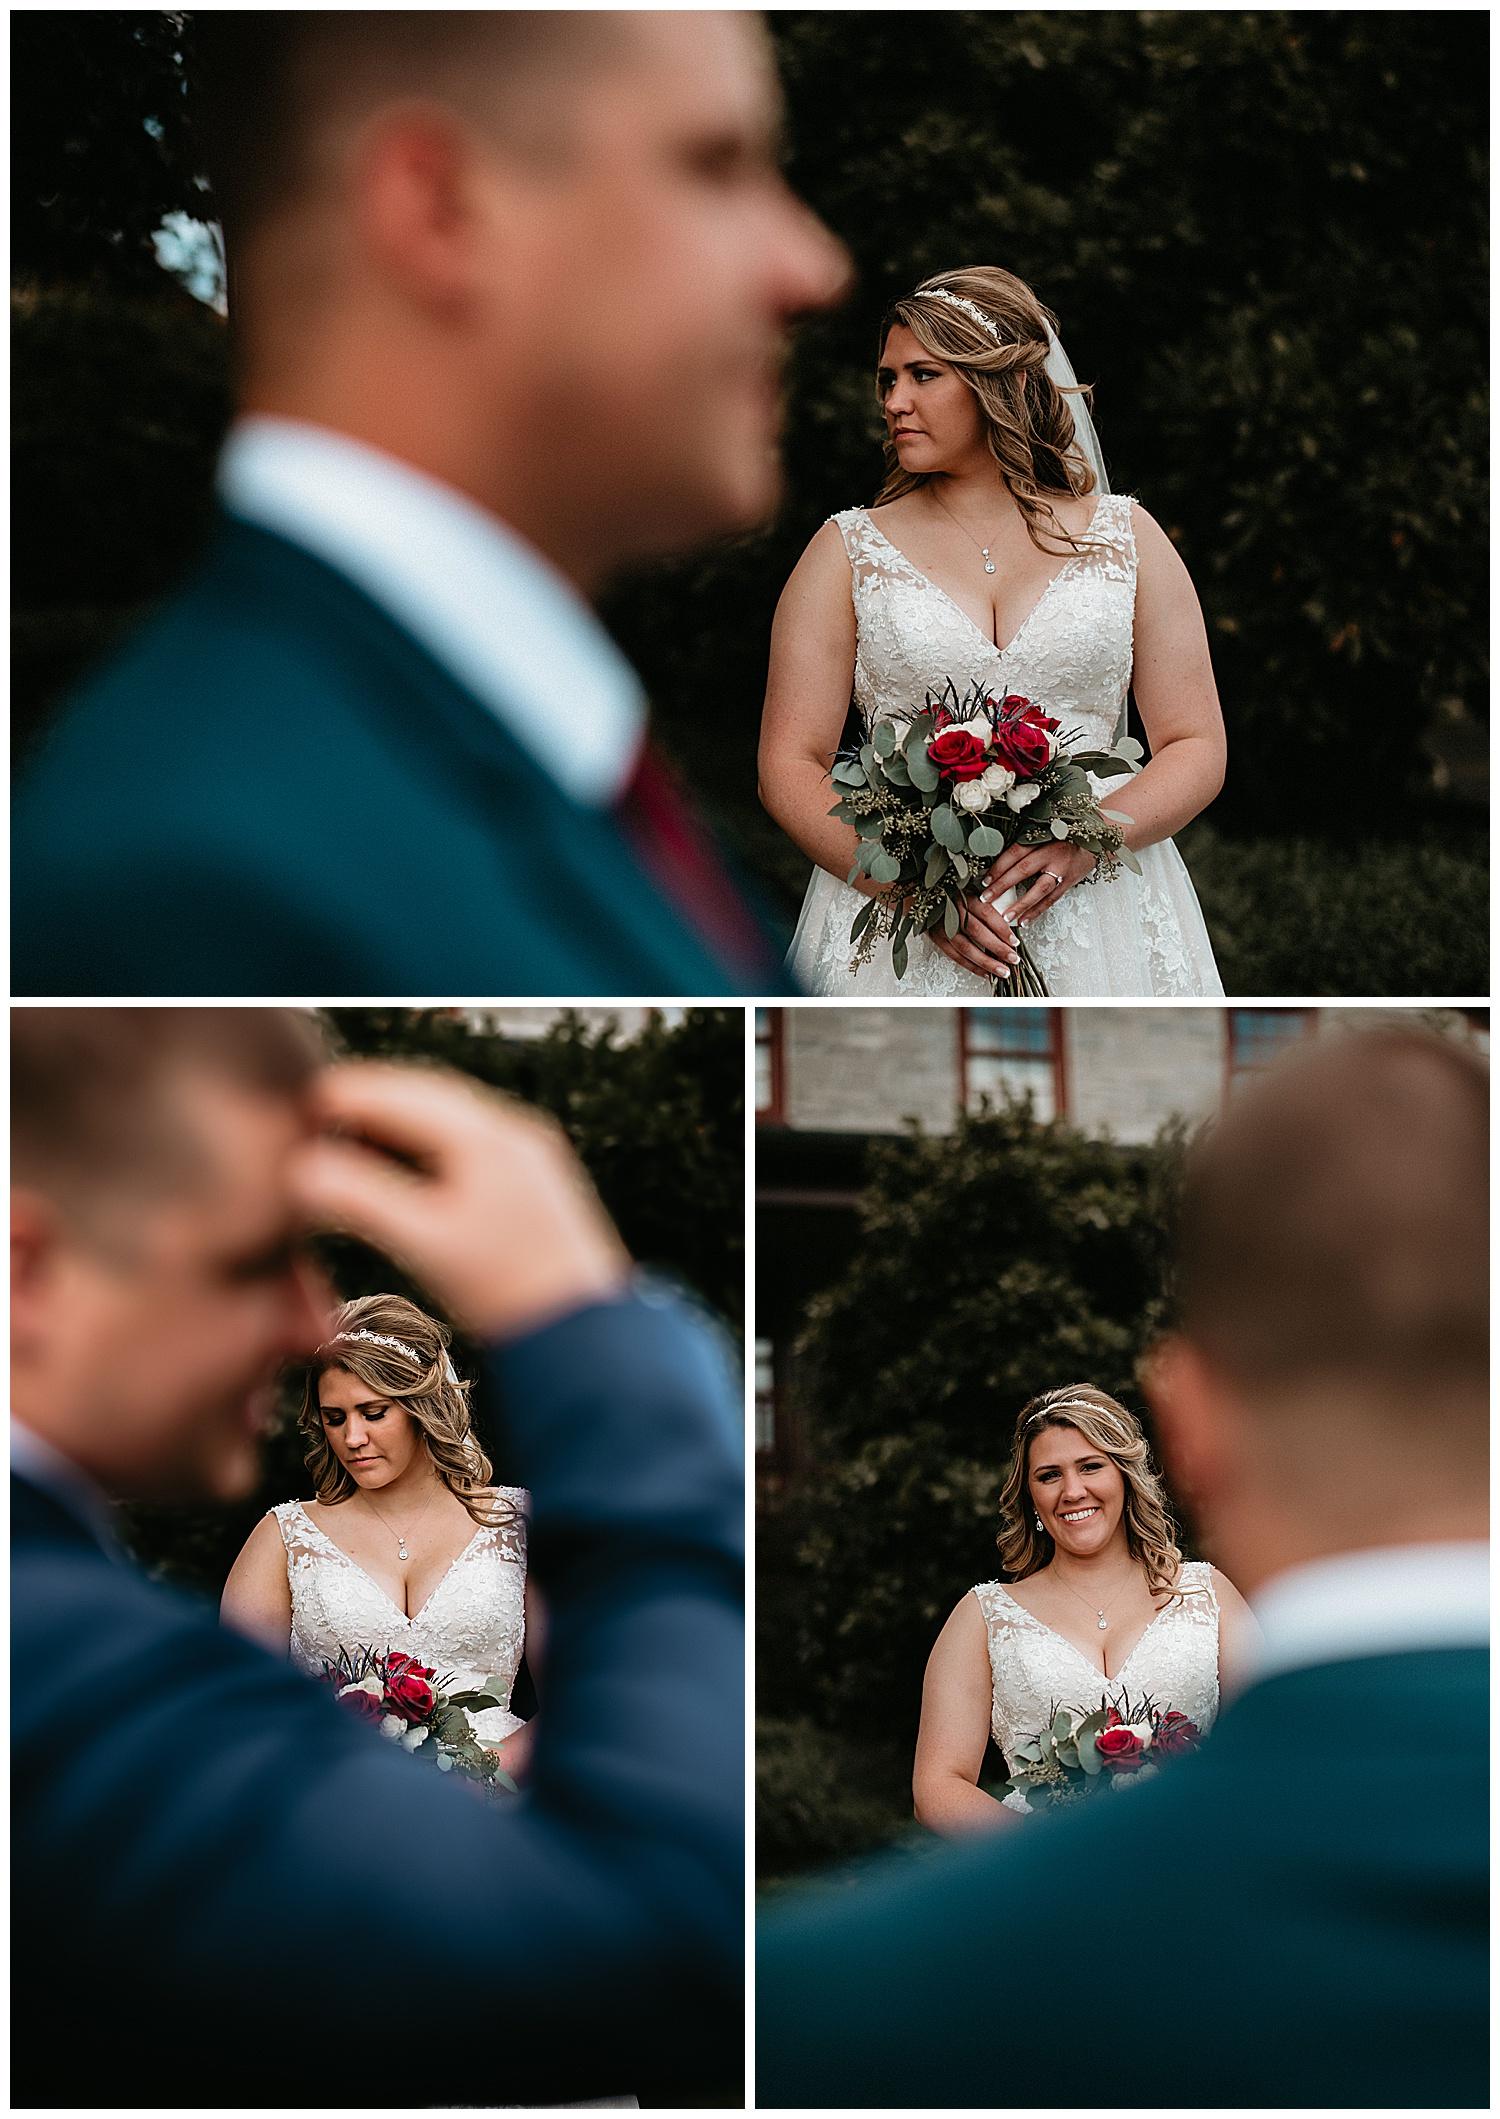 NEPA-Bloomgsburg-Wedding-Photographer-at-The-Barn-at-Greystone-Farms-Watsontown-PA_0032.jpg